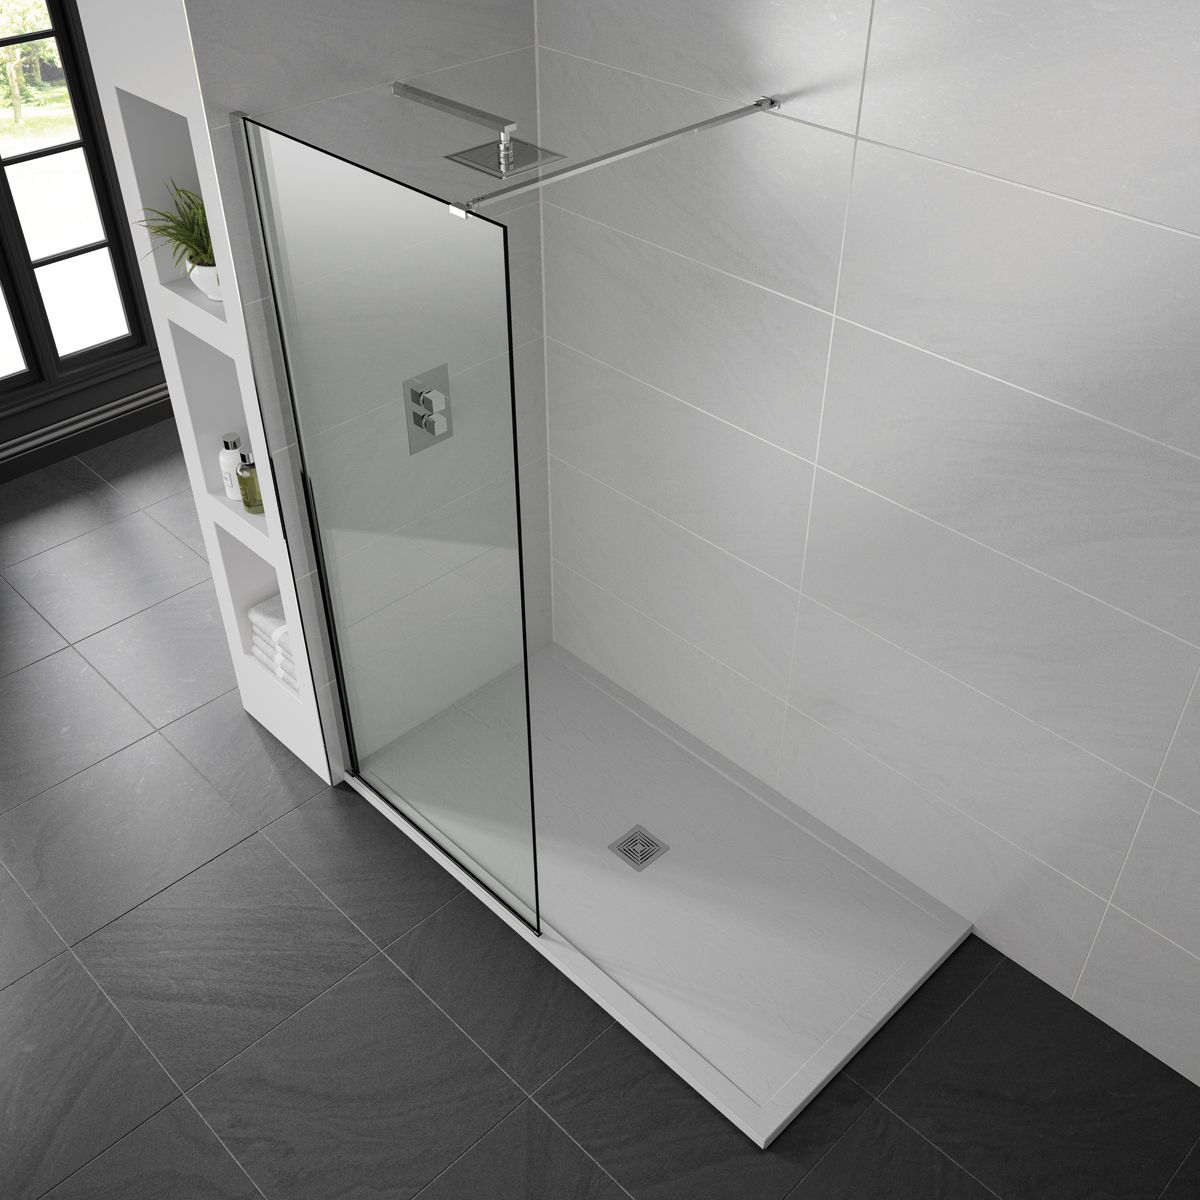 Aquadart Grey Slate Shower Tray 1200 x 800 Lifestyle